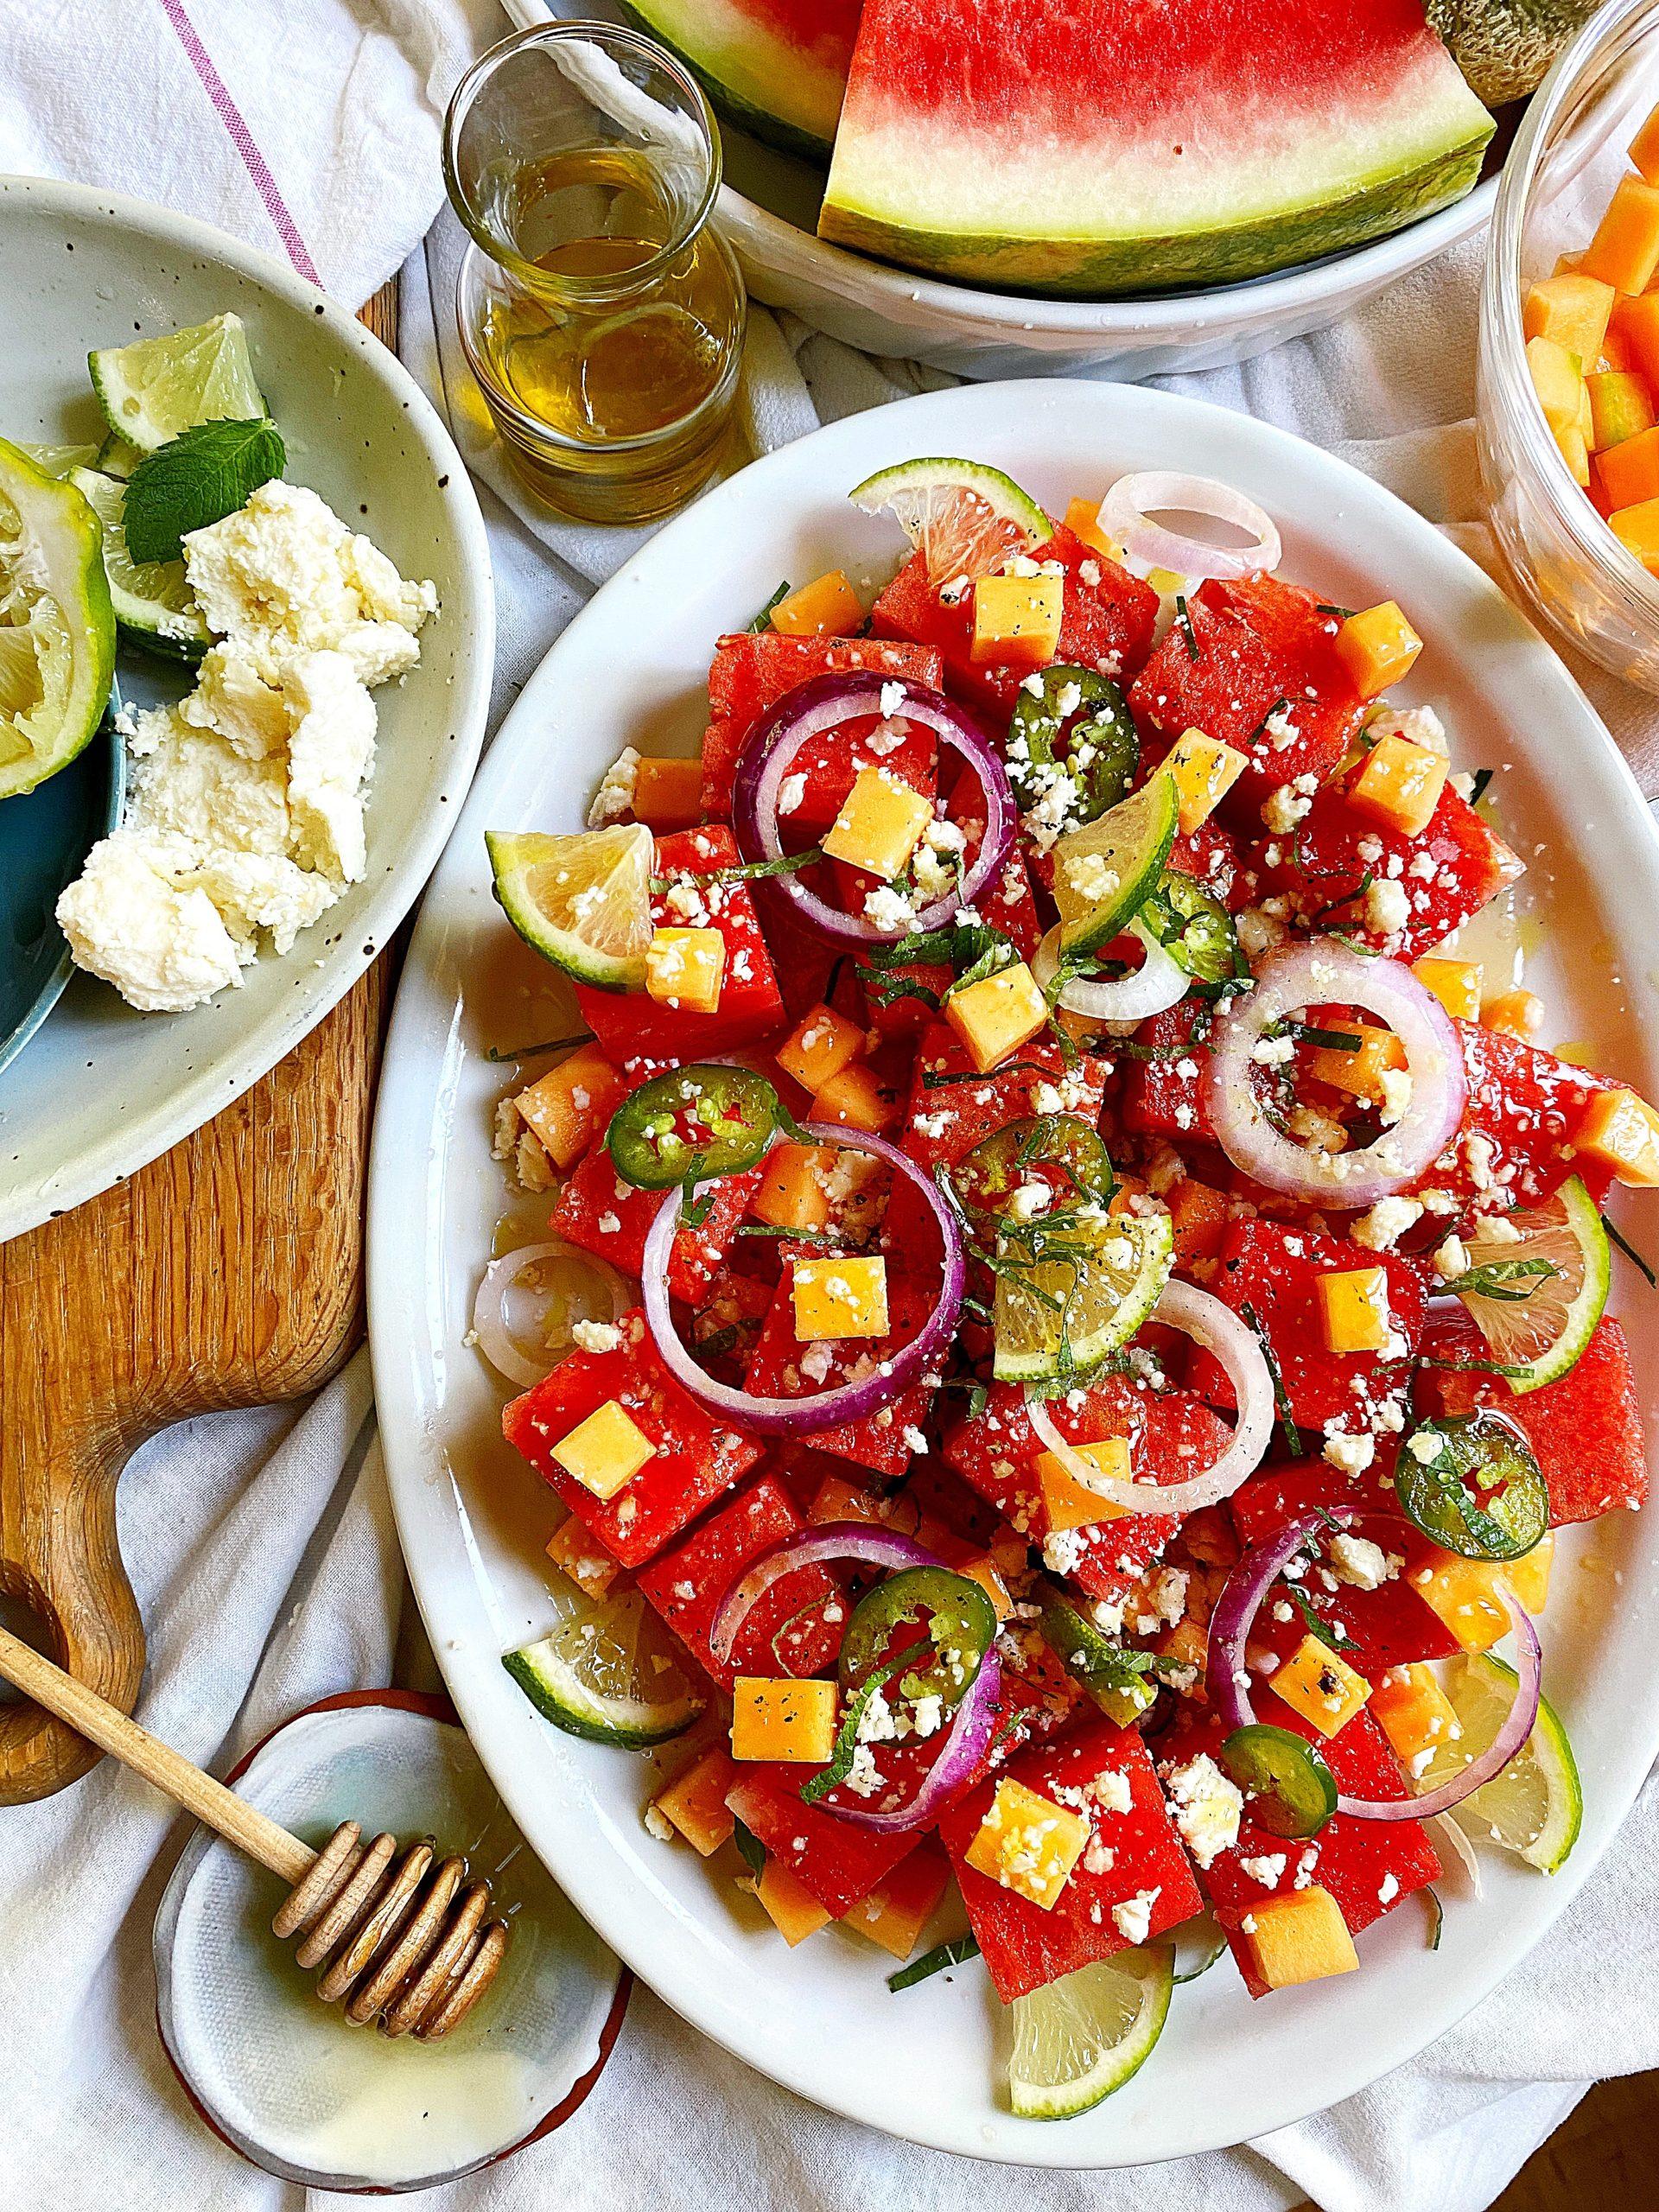 mojito melon summer salad - salad dressing added